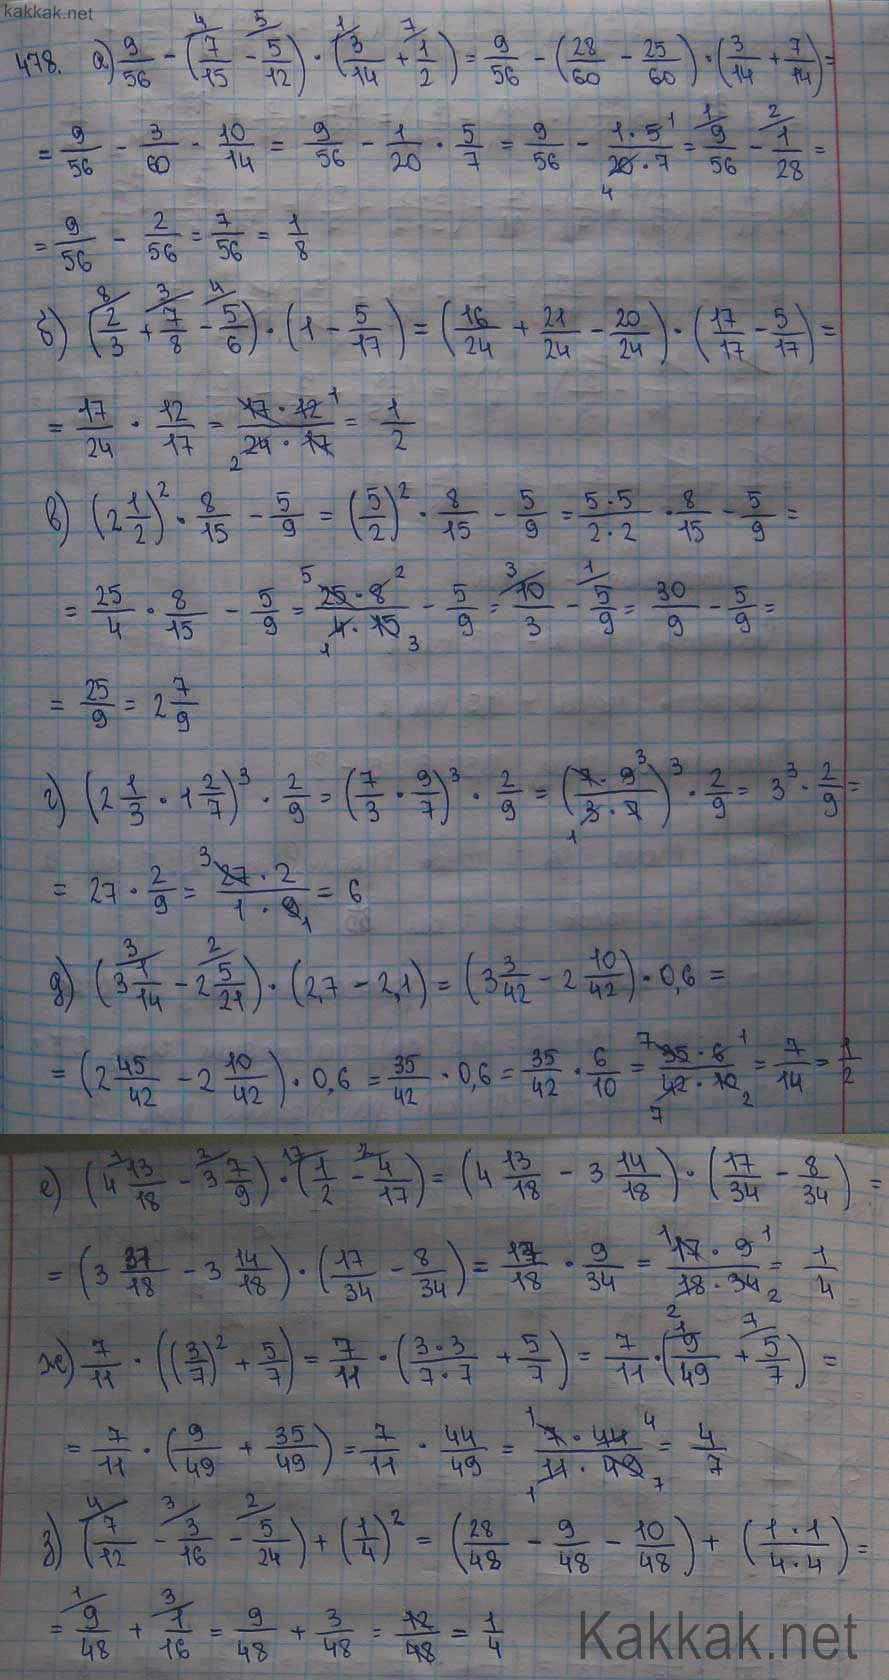 математика 6 класс виленкин гдз kakkak net